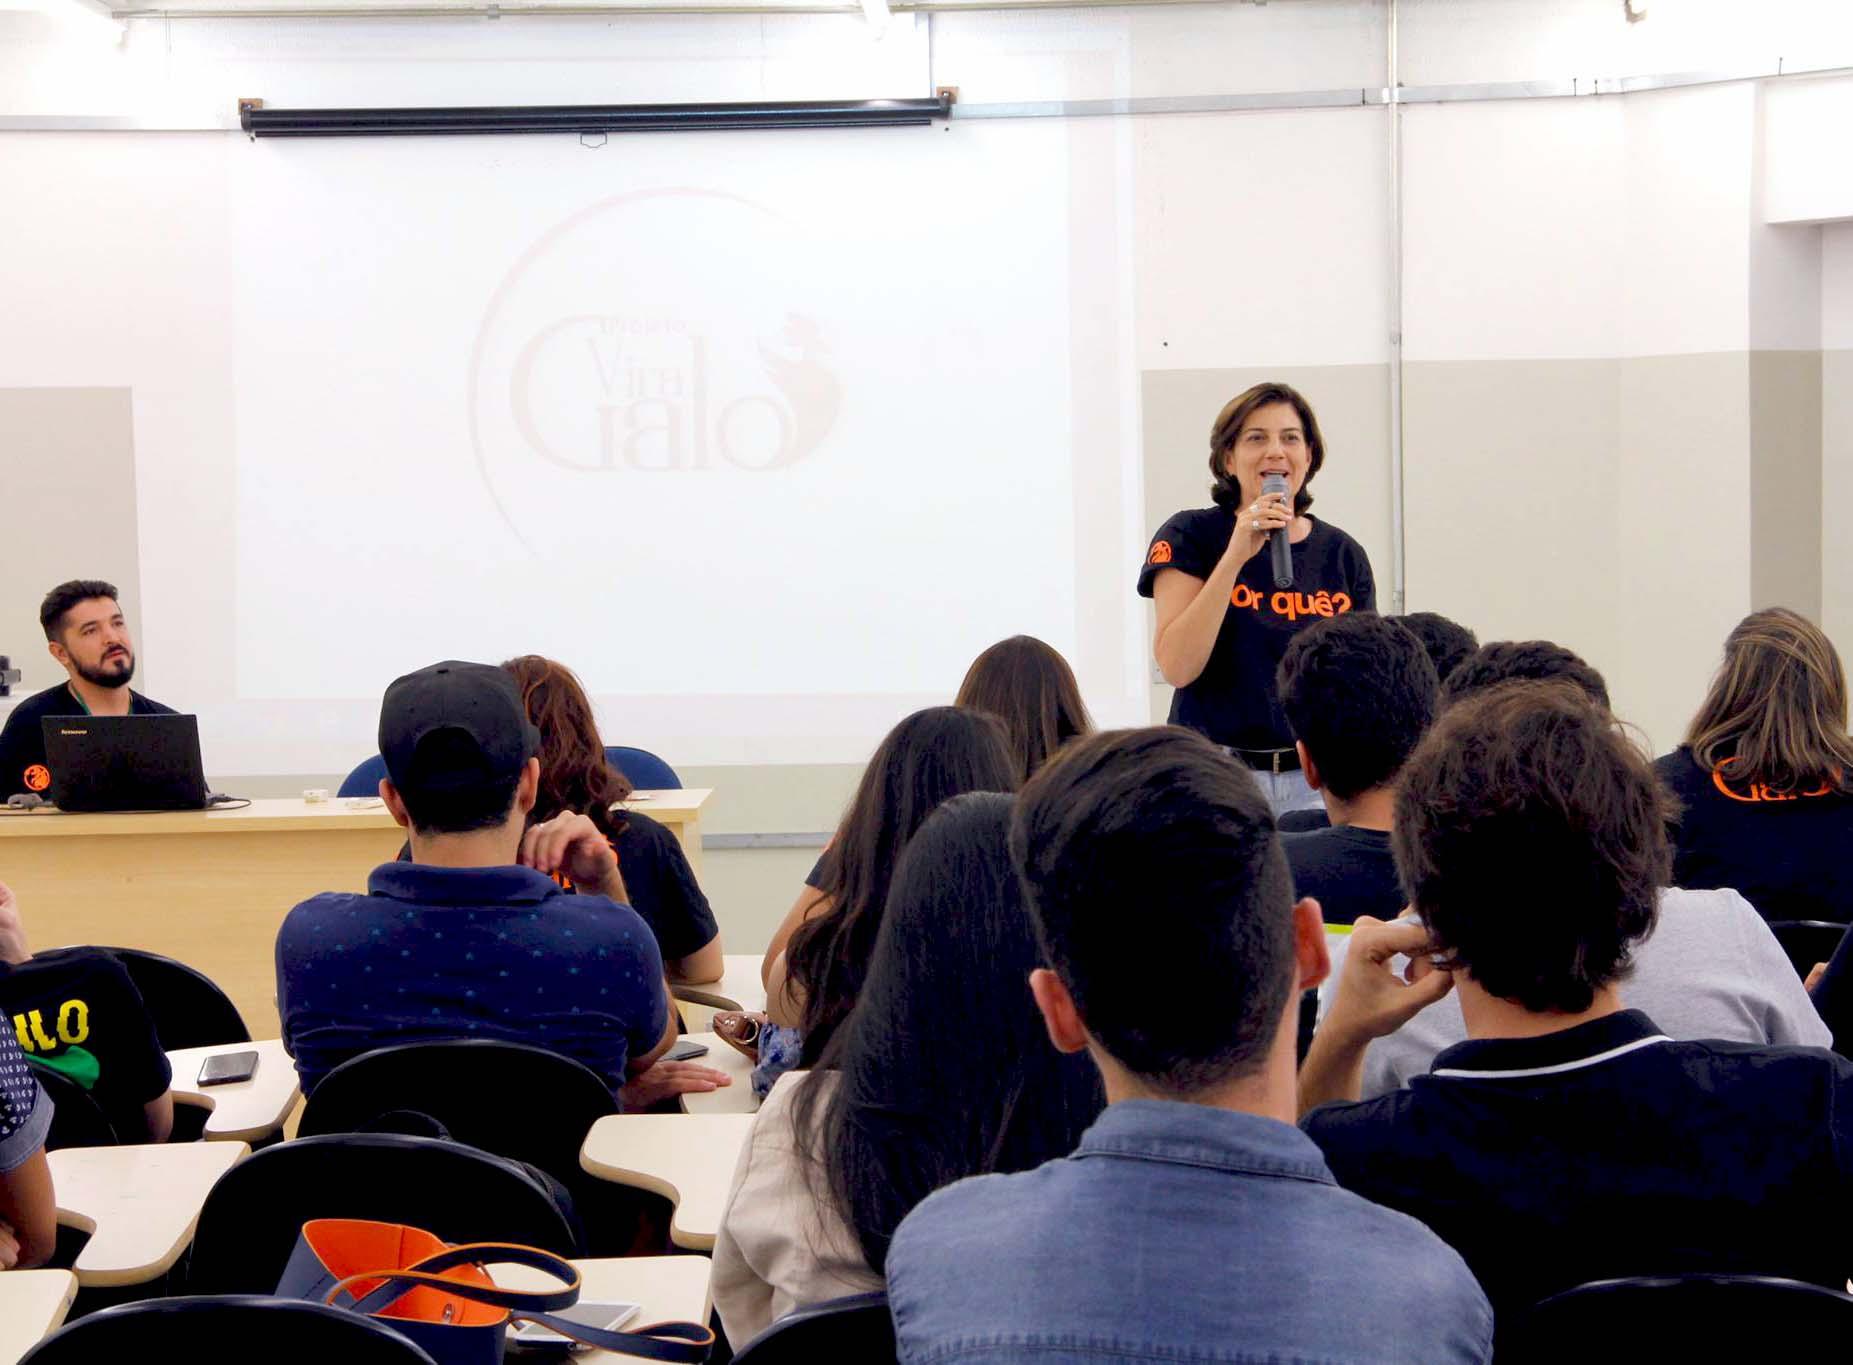 Alunos de Publicidade e Propaganda apresentam o projeto Vira Galo